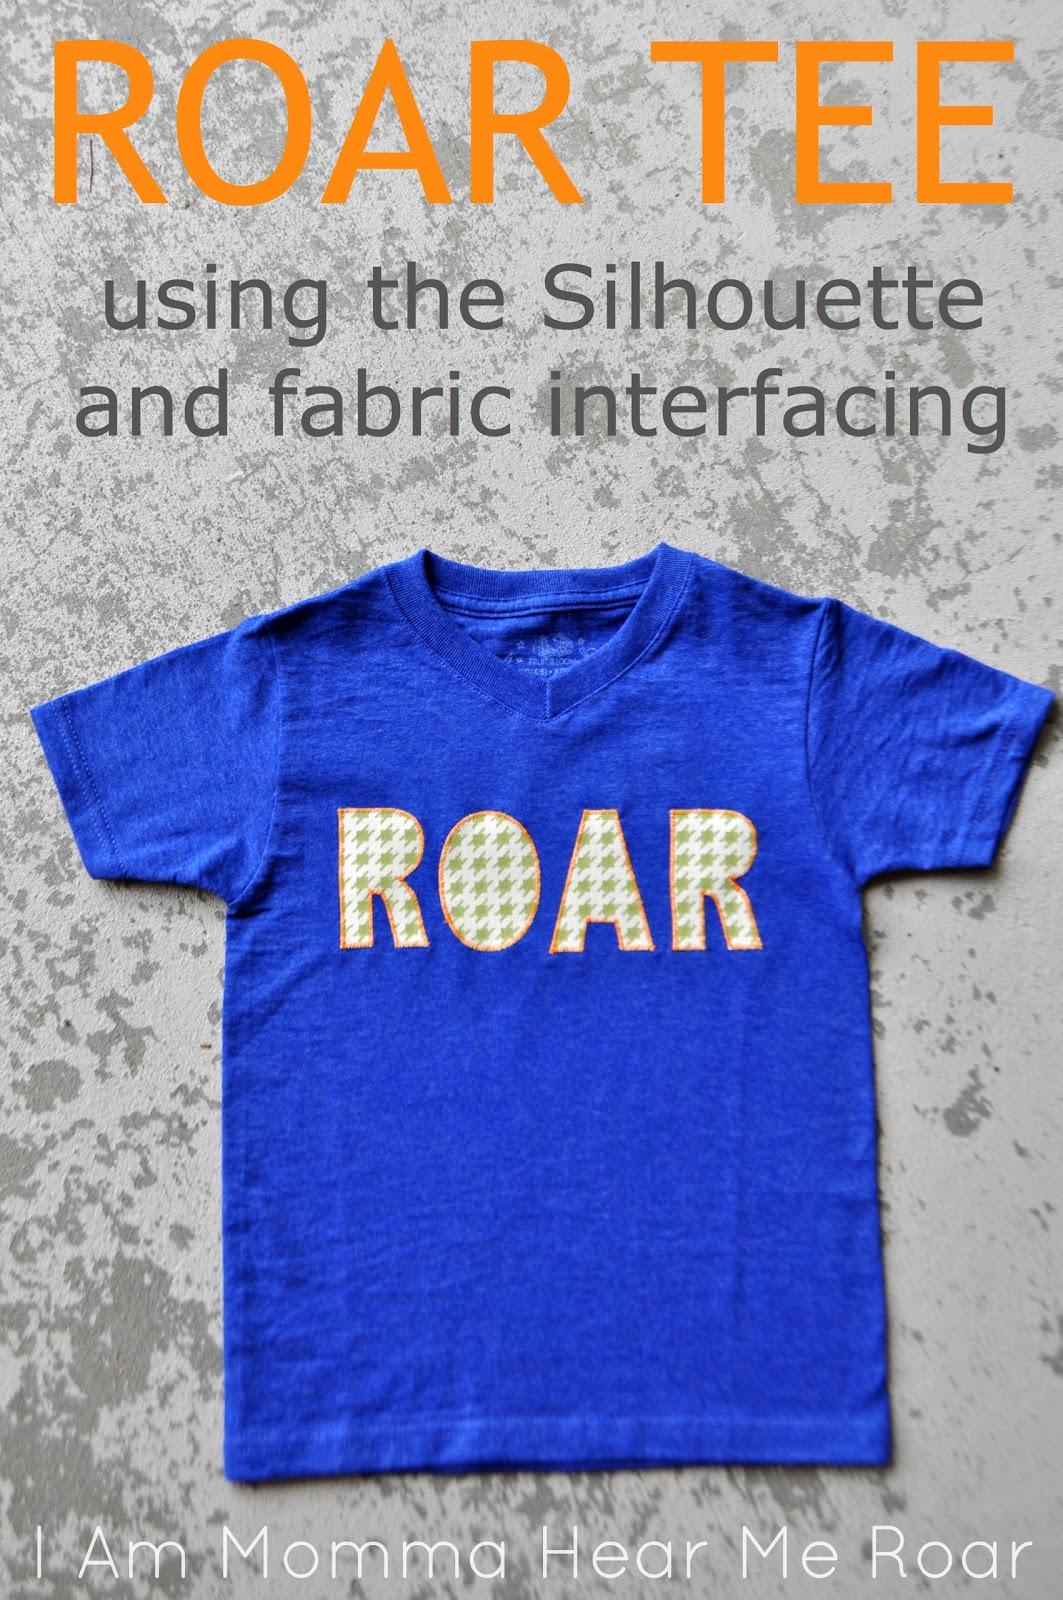 I Am Momma - Hear Me Roar: Roar Tee AND a Silhouette Promo - photo#22